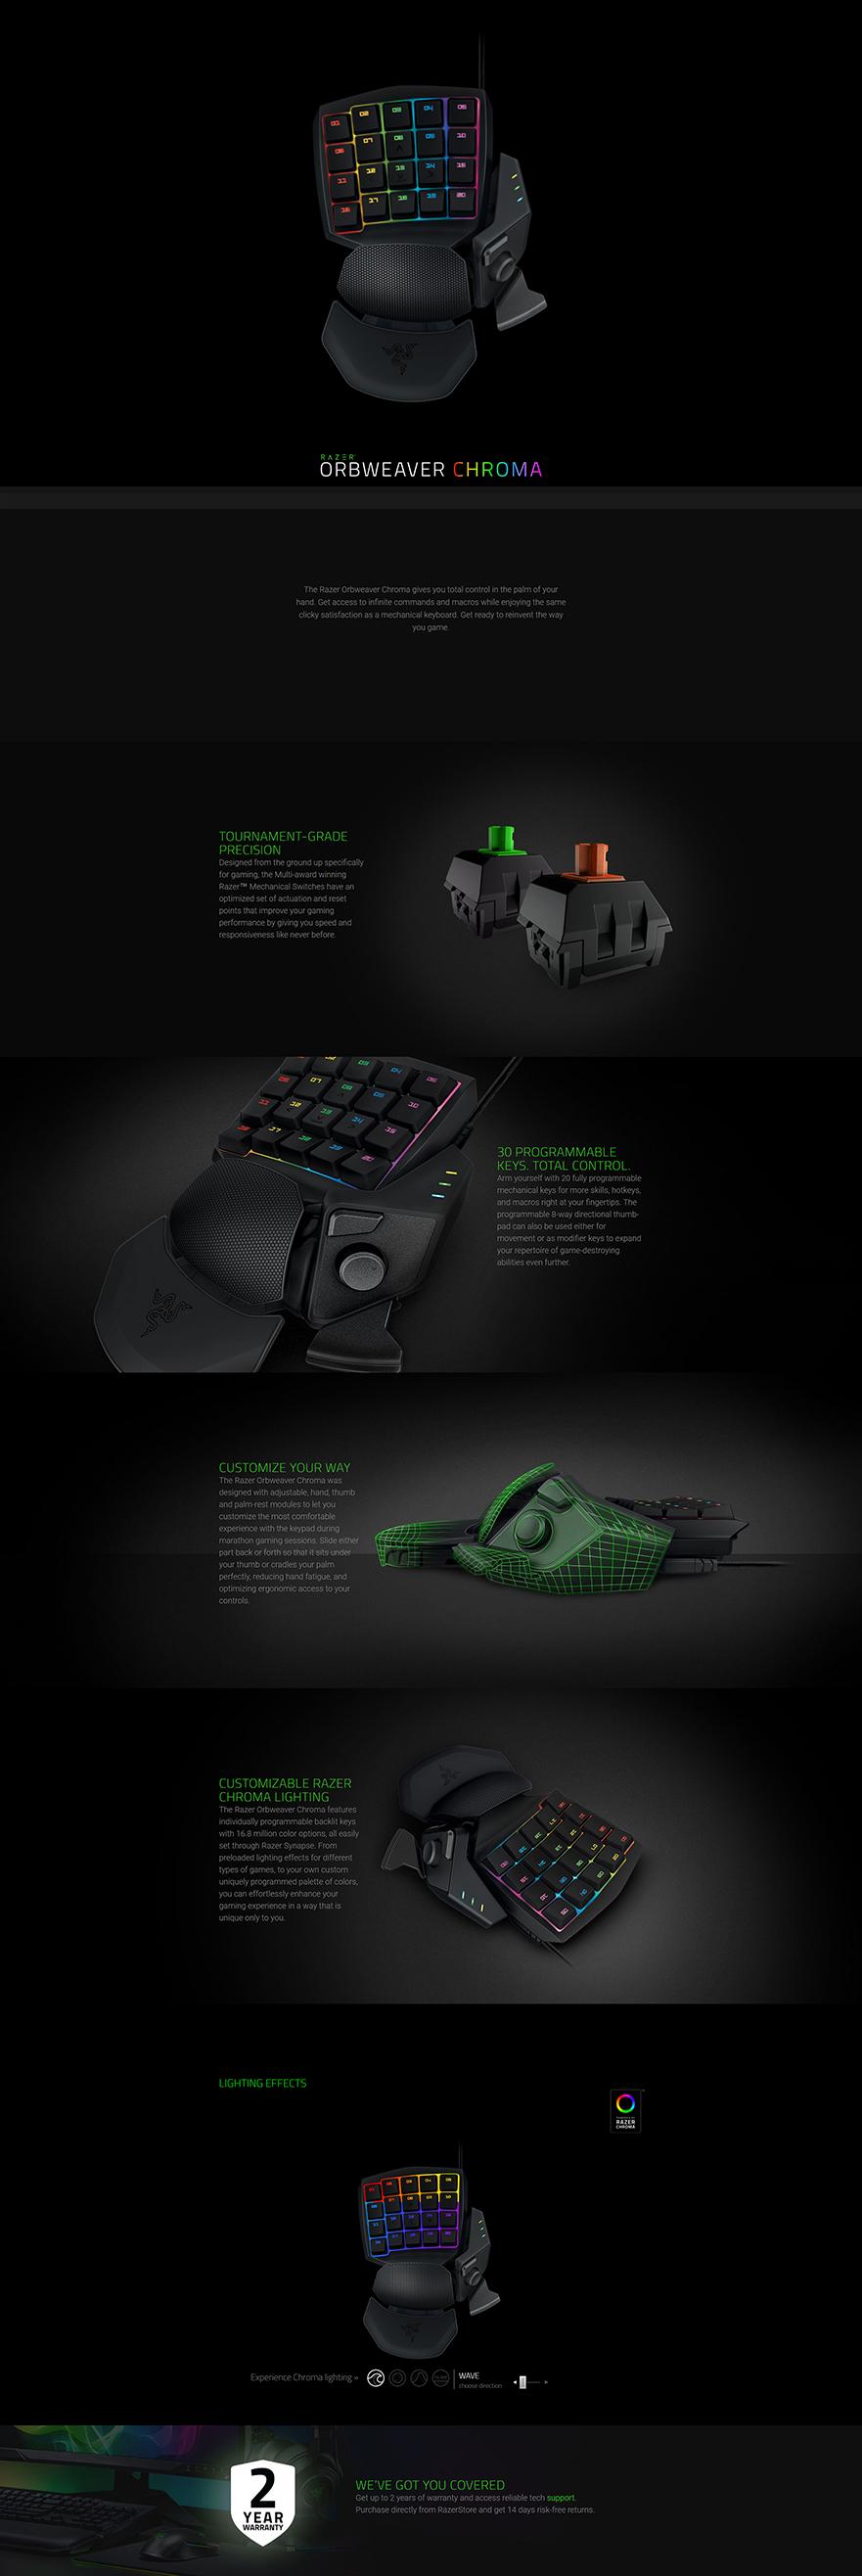 Razer Orbweaver Elite Chroma RGB Mechanical Gaming Keypad